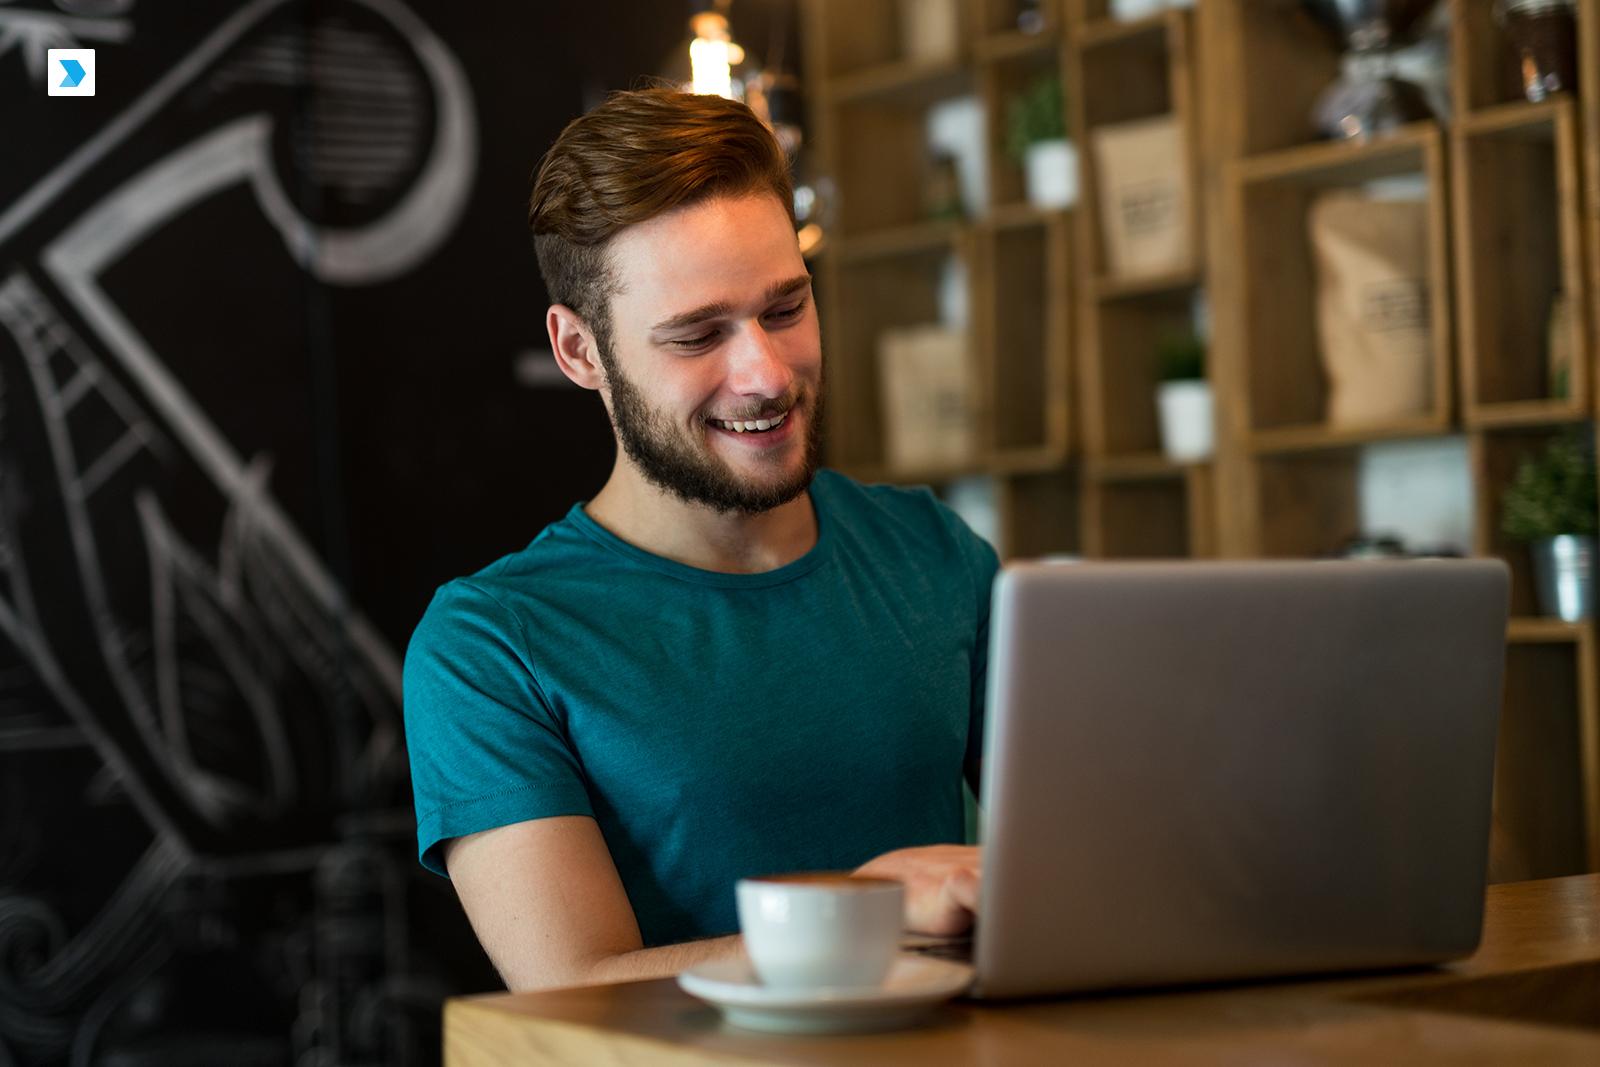 How to Create an Effective Digital Marketing CV